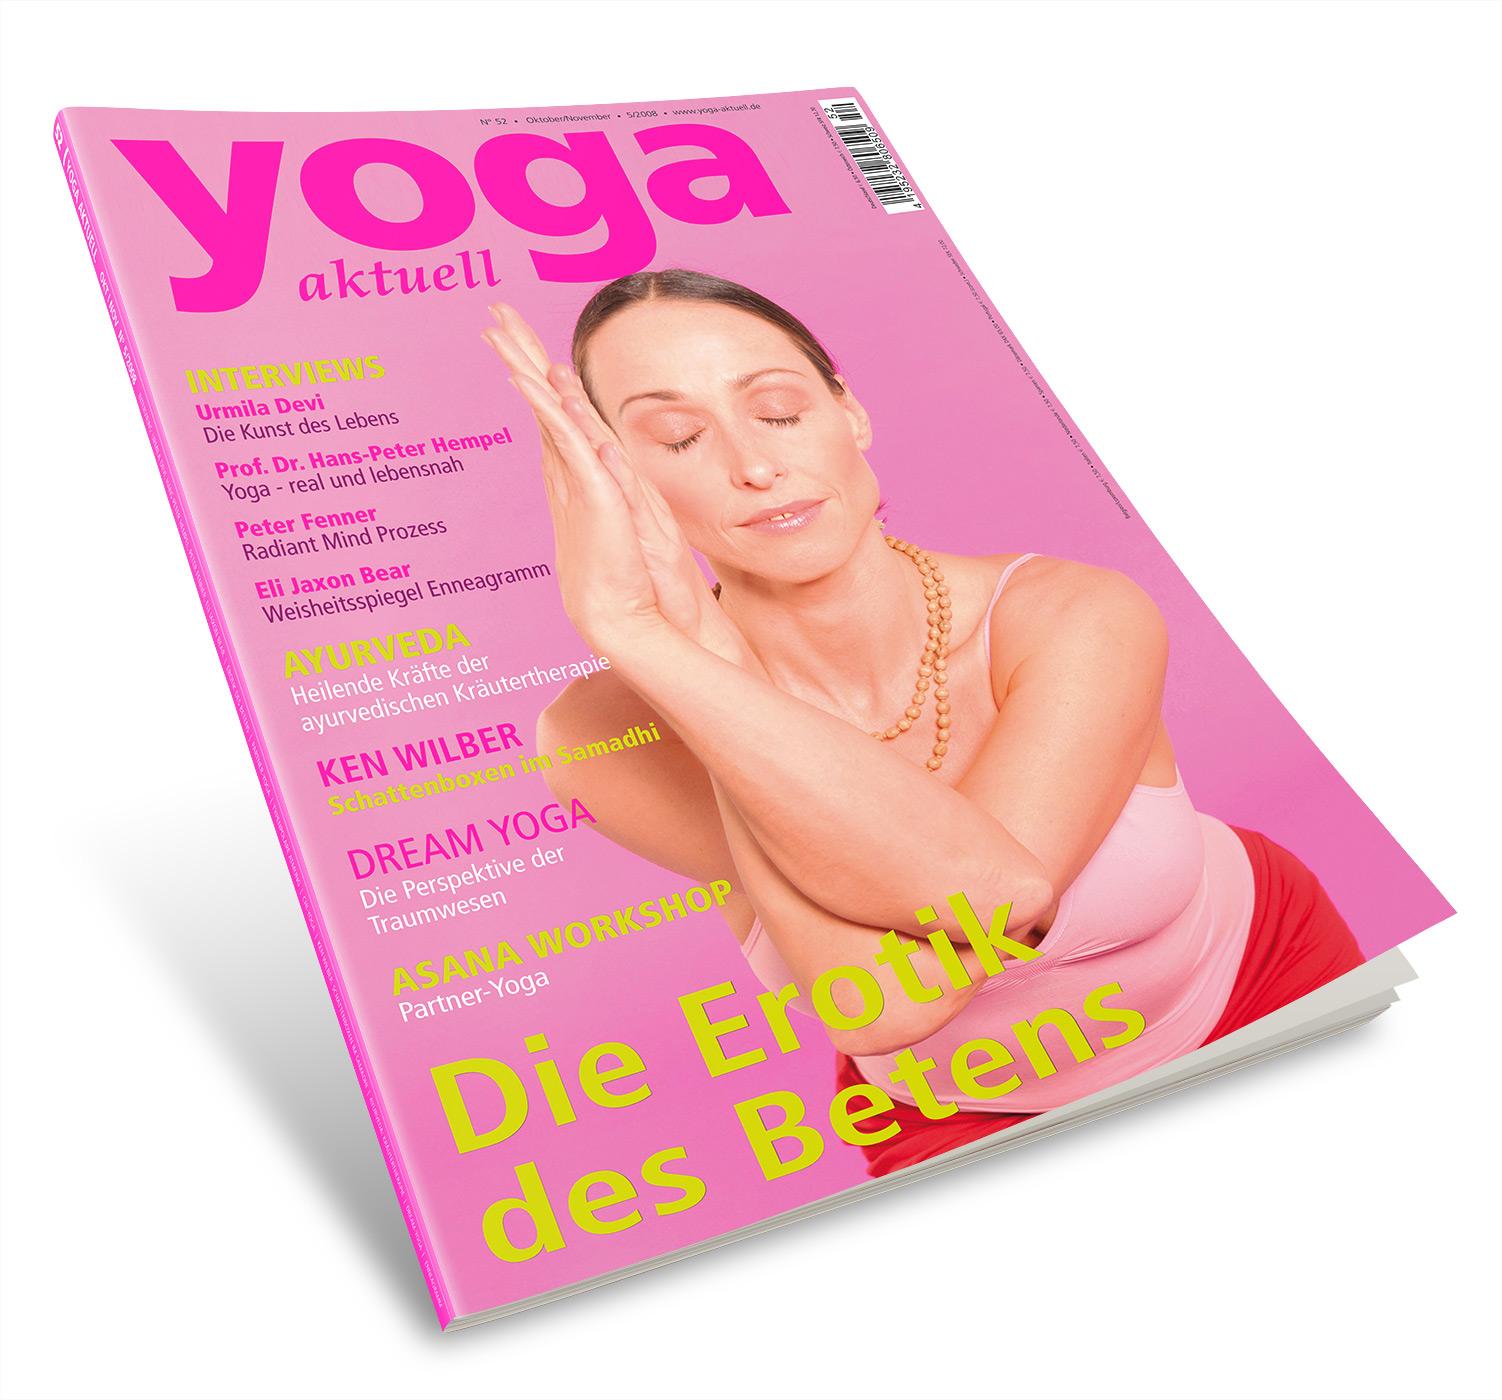 Yoga Aktuell 52 - 05/2008